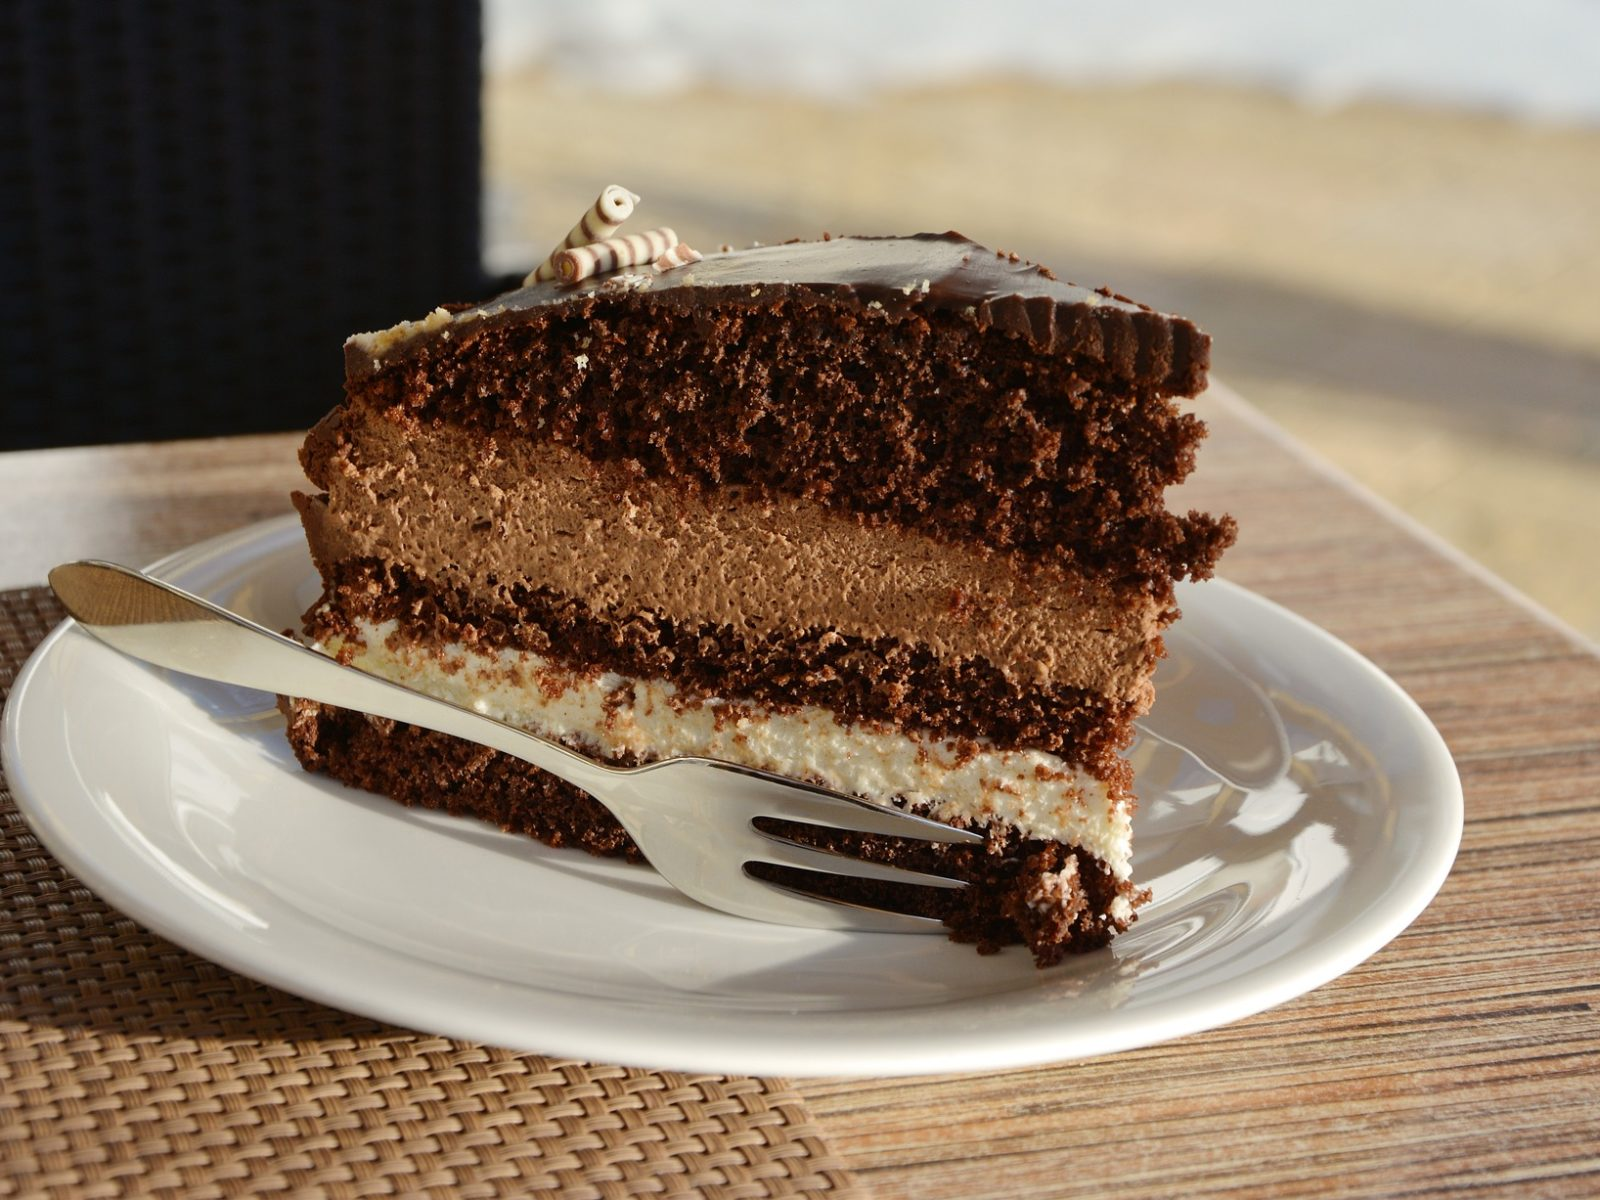 cake-2001781_1920